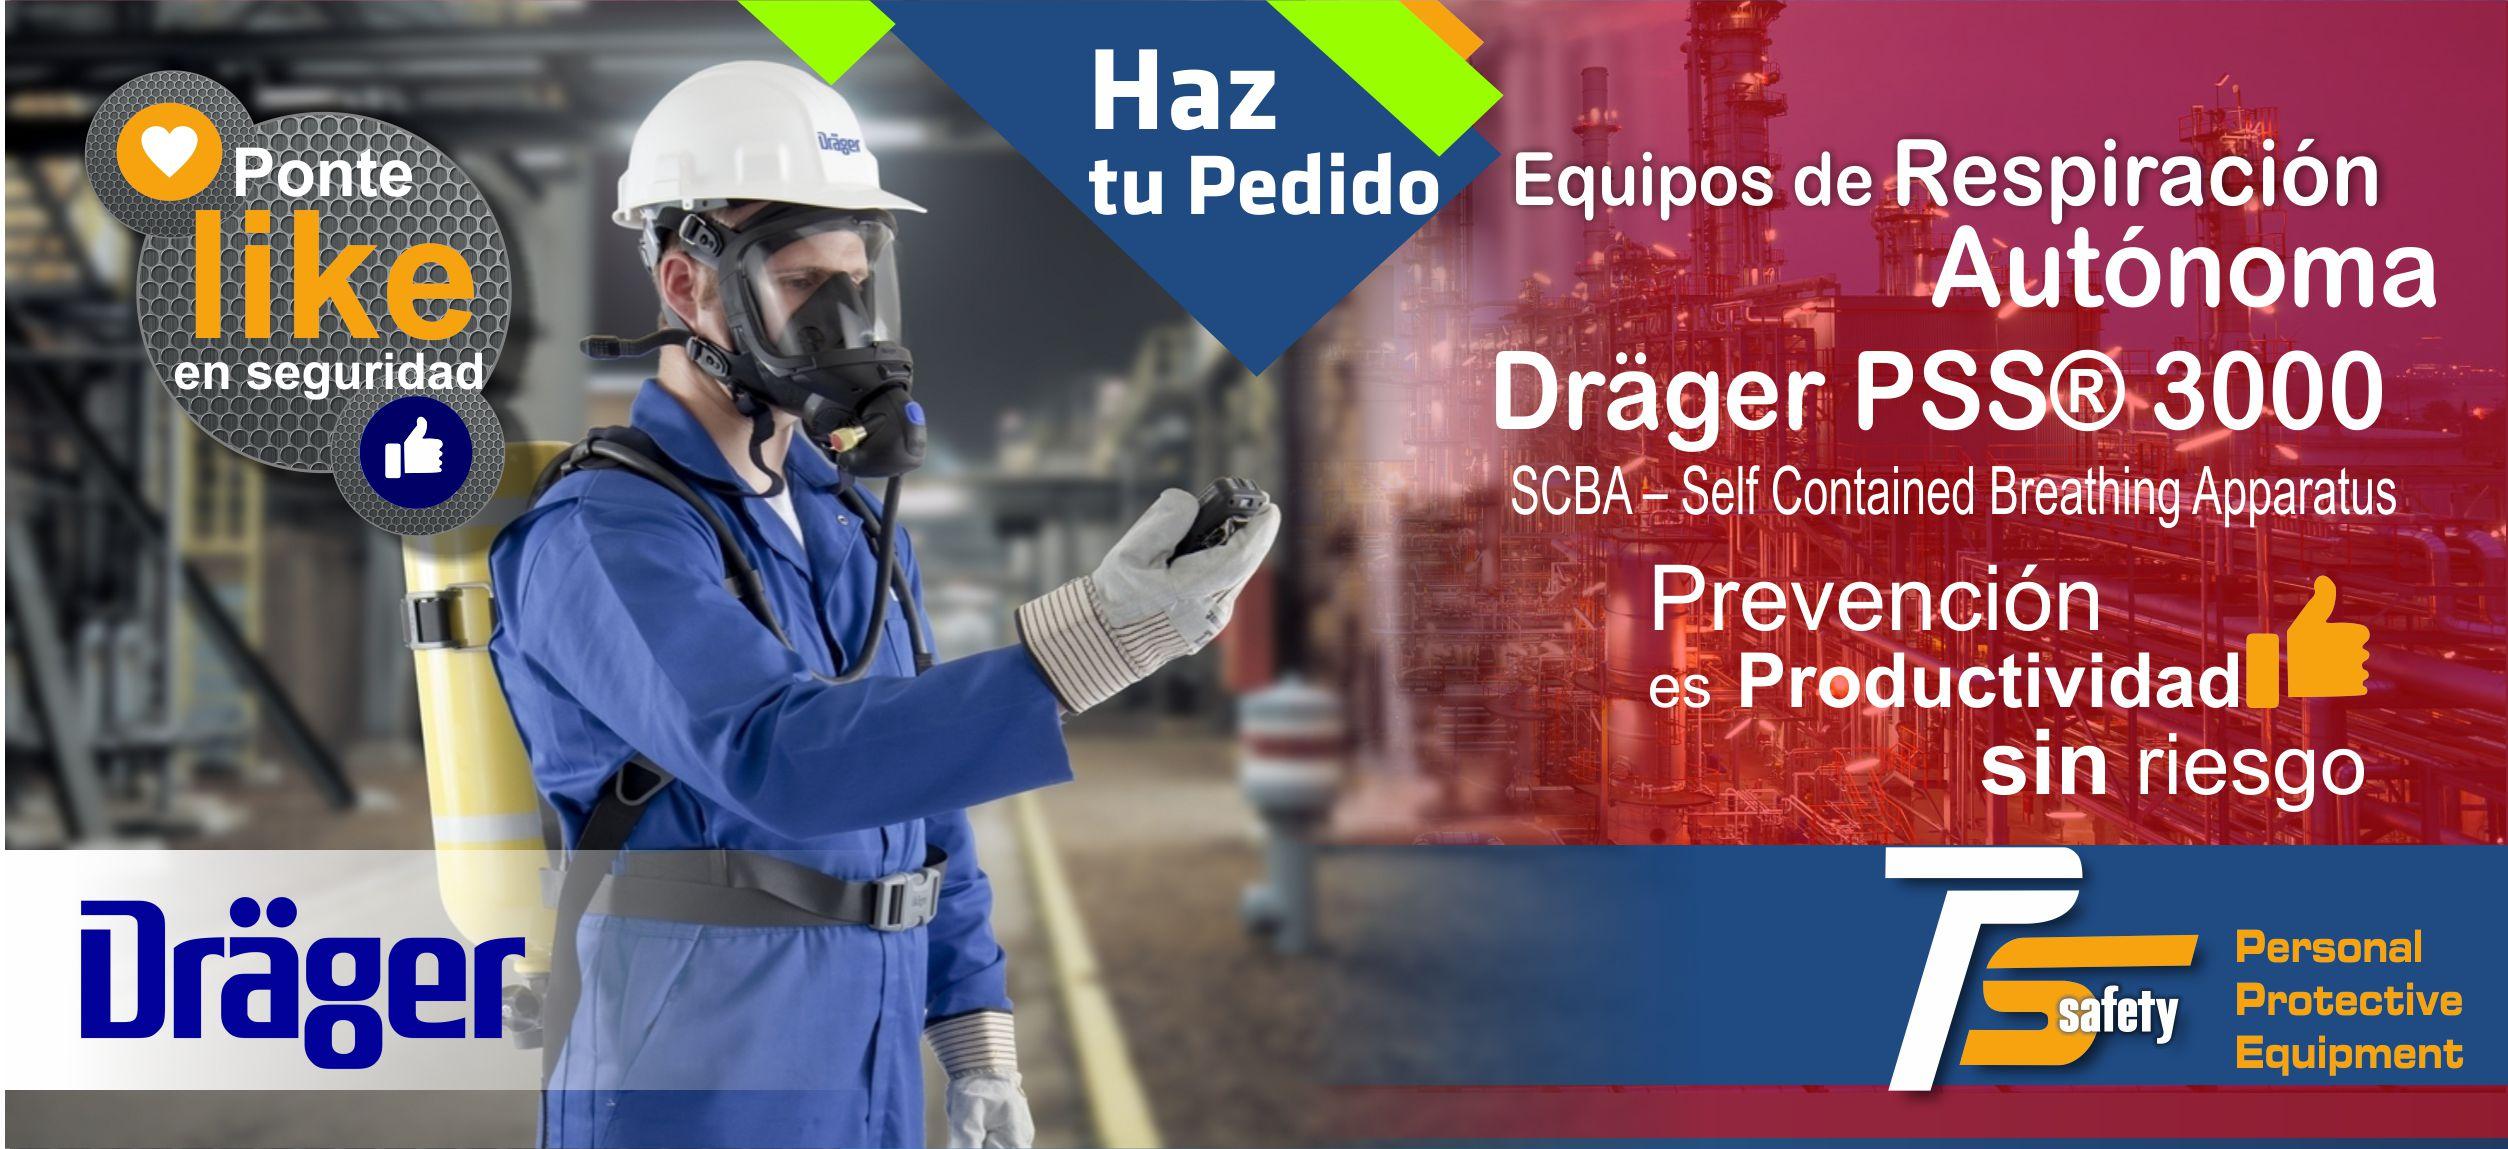 OFERTA SCBA PSS3000 Equipo de Respiracion Autonoma 30 min (2160 psi)